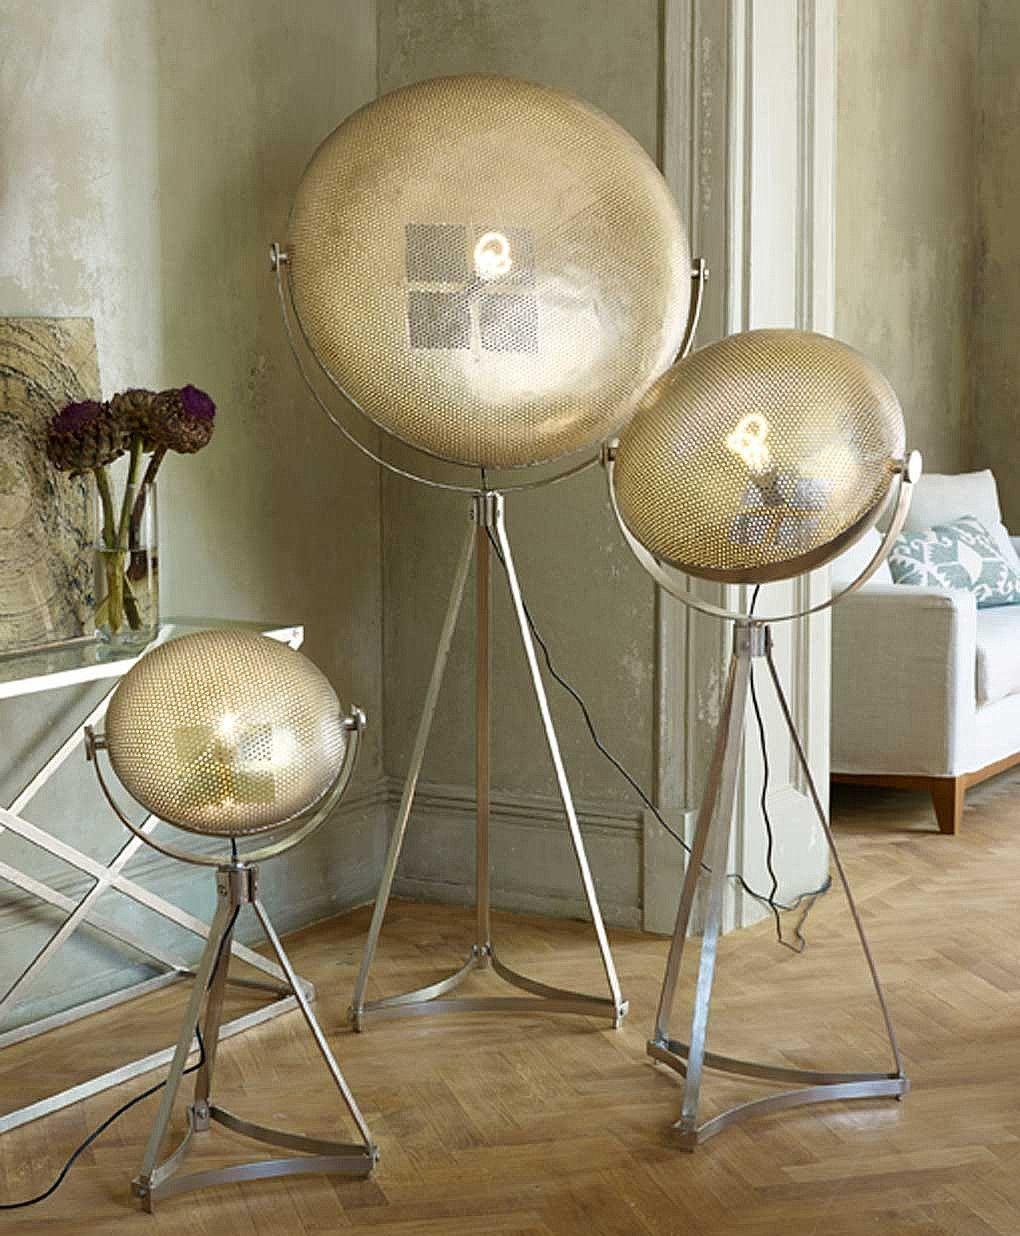 Artisan Disc Industrial Floor Lamp From Lombok Large Floor Lamp Industrial Floor Lamps Floor Lamp